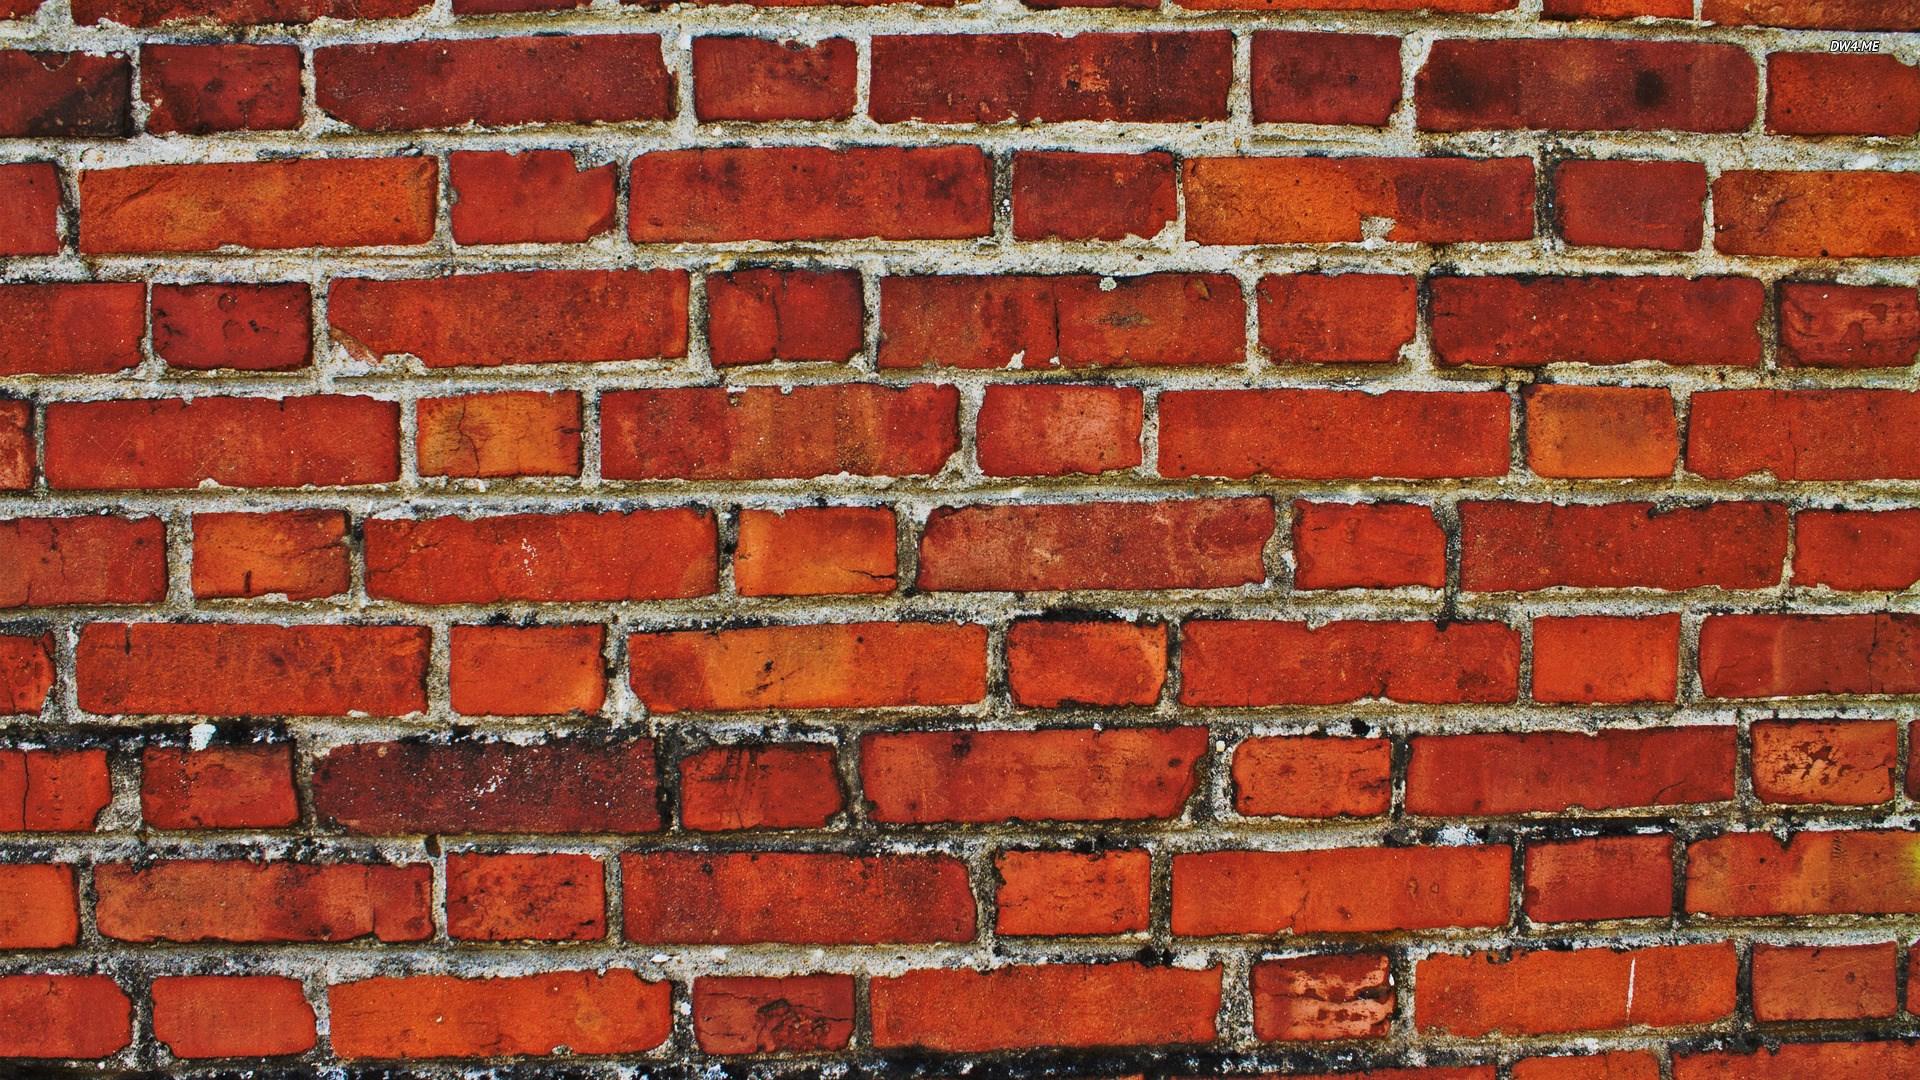 brick-images-wallpaper-wp3803435